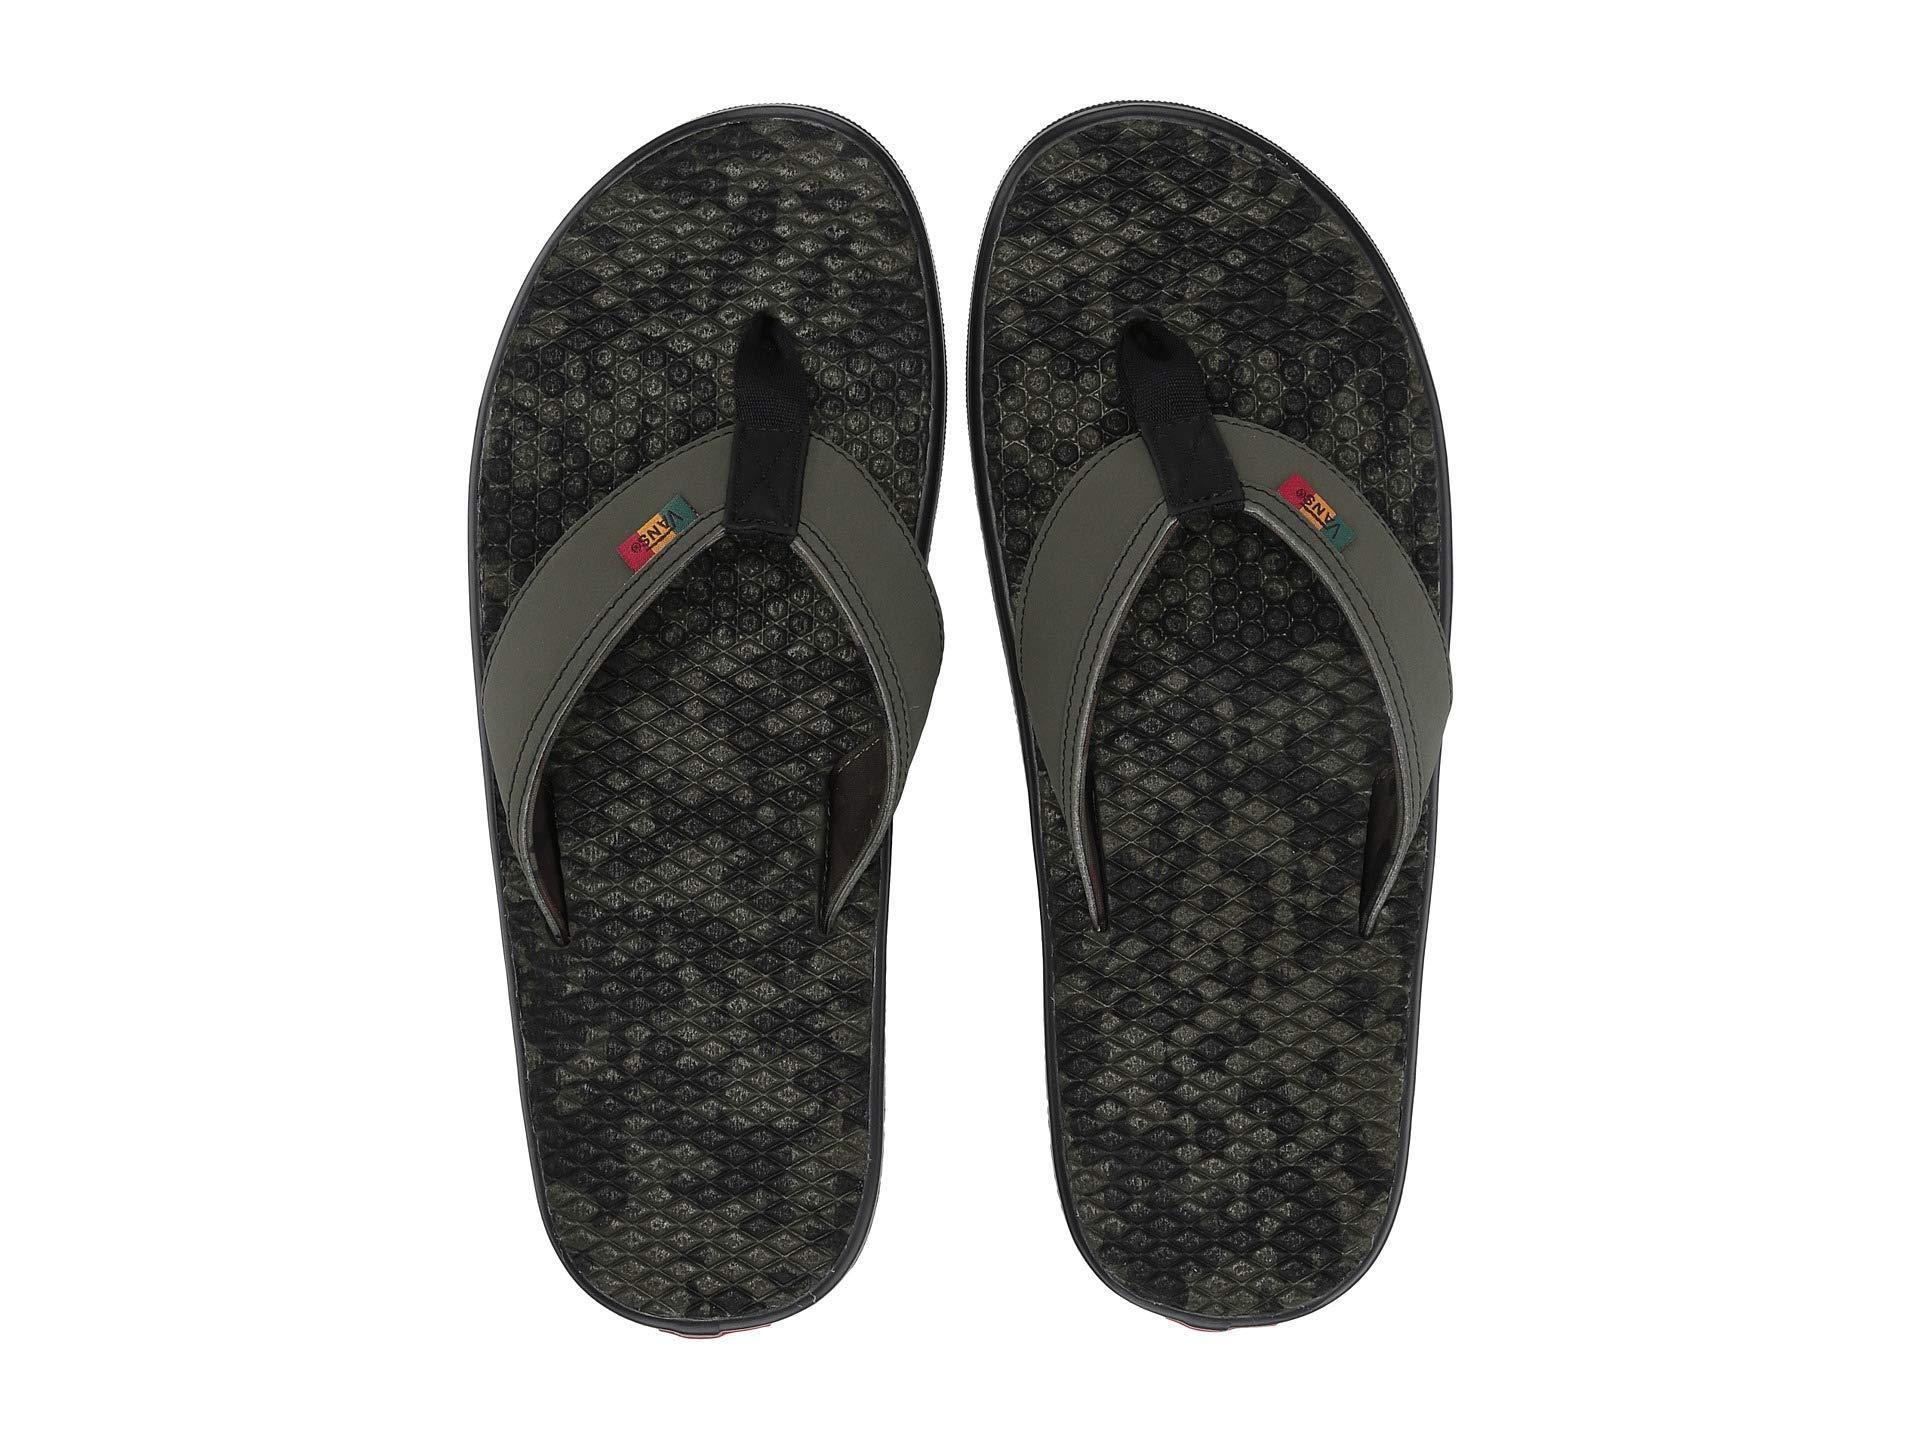 ec2c07381a Vans - La Costa Lite ((checkerboard) Black white) Men s Sandals for. View  fullscreen